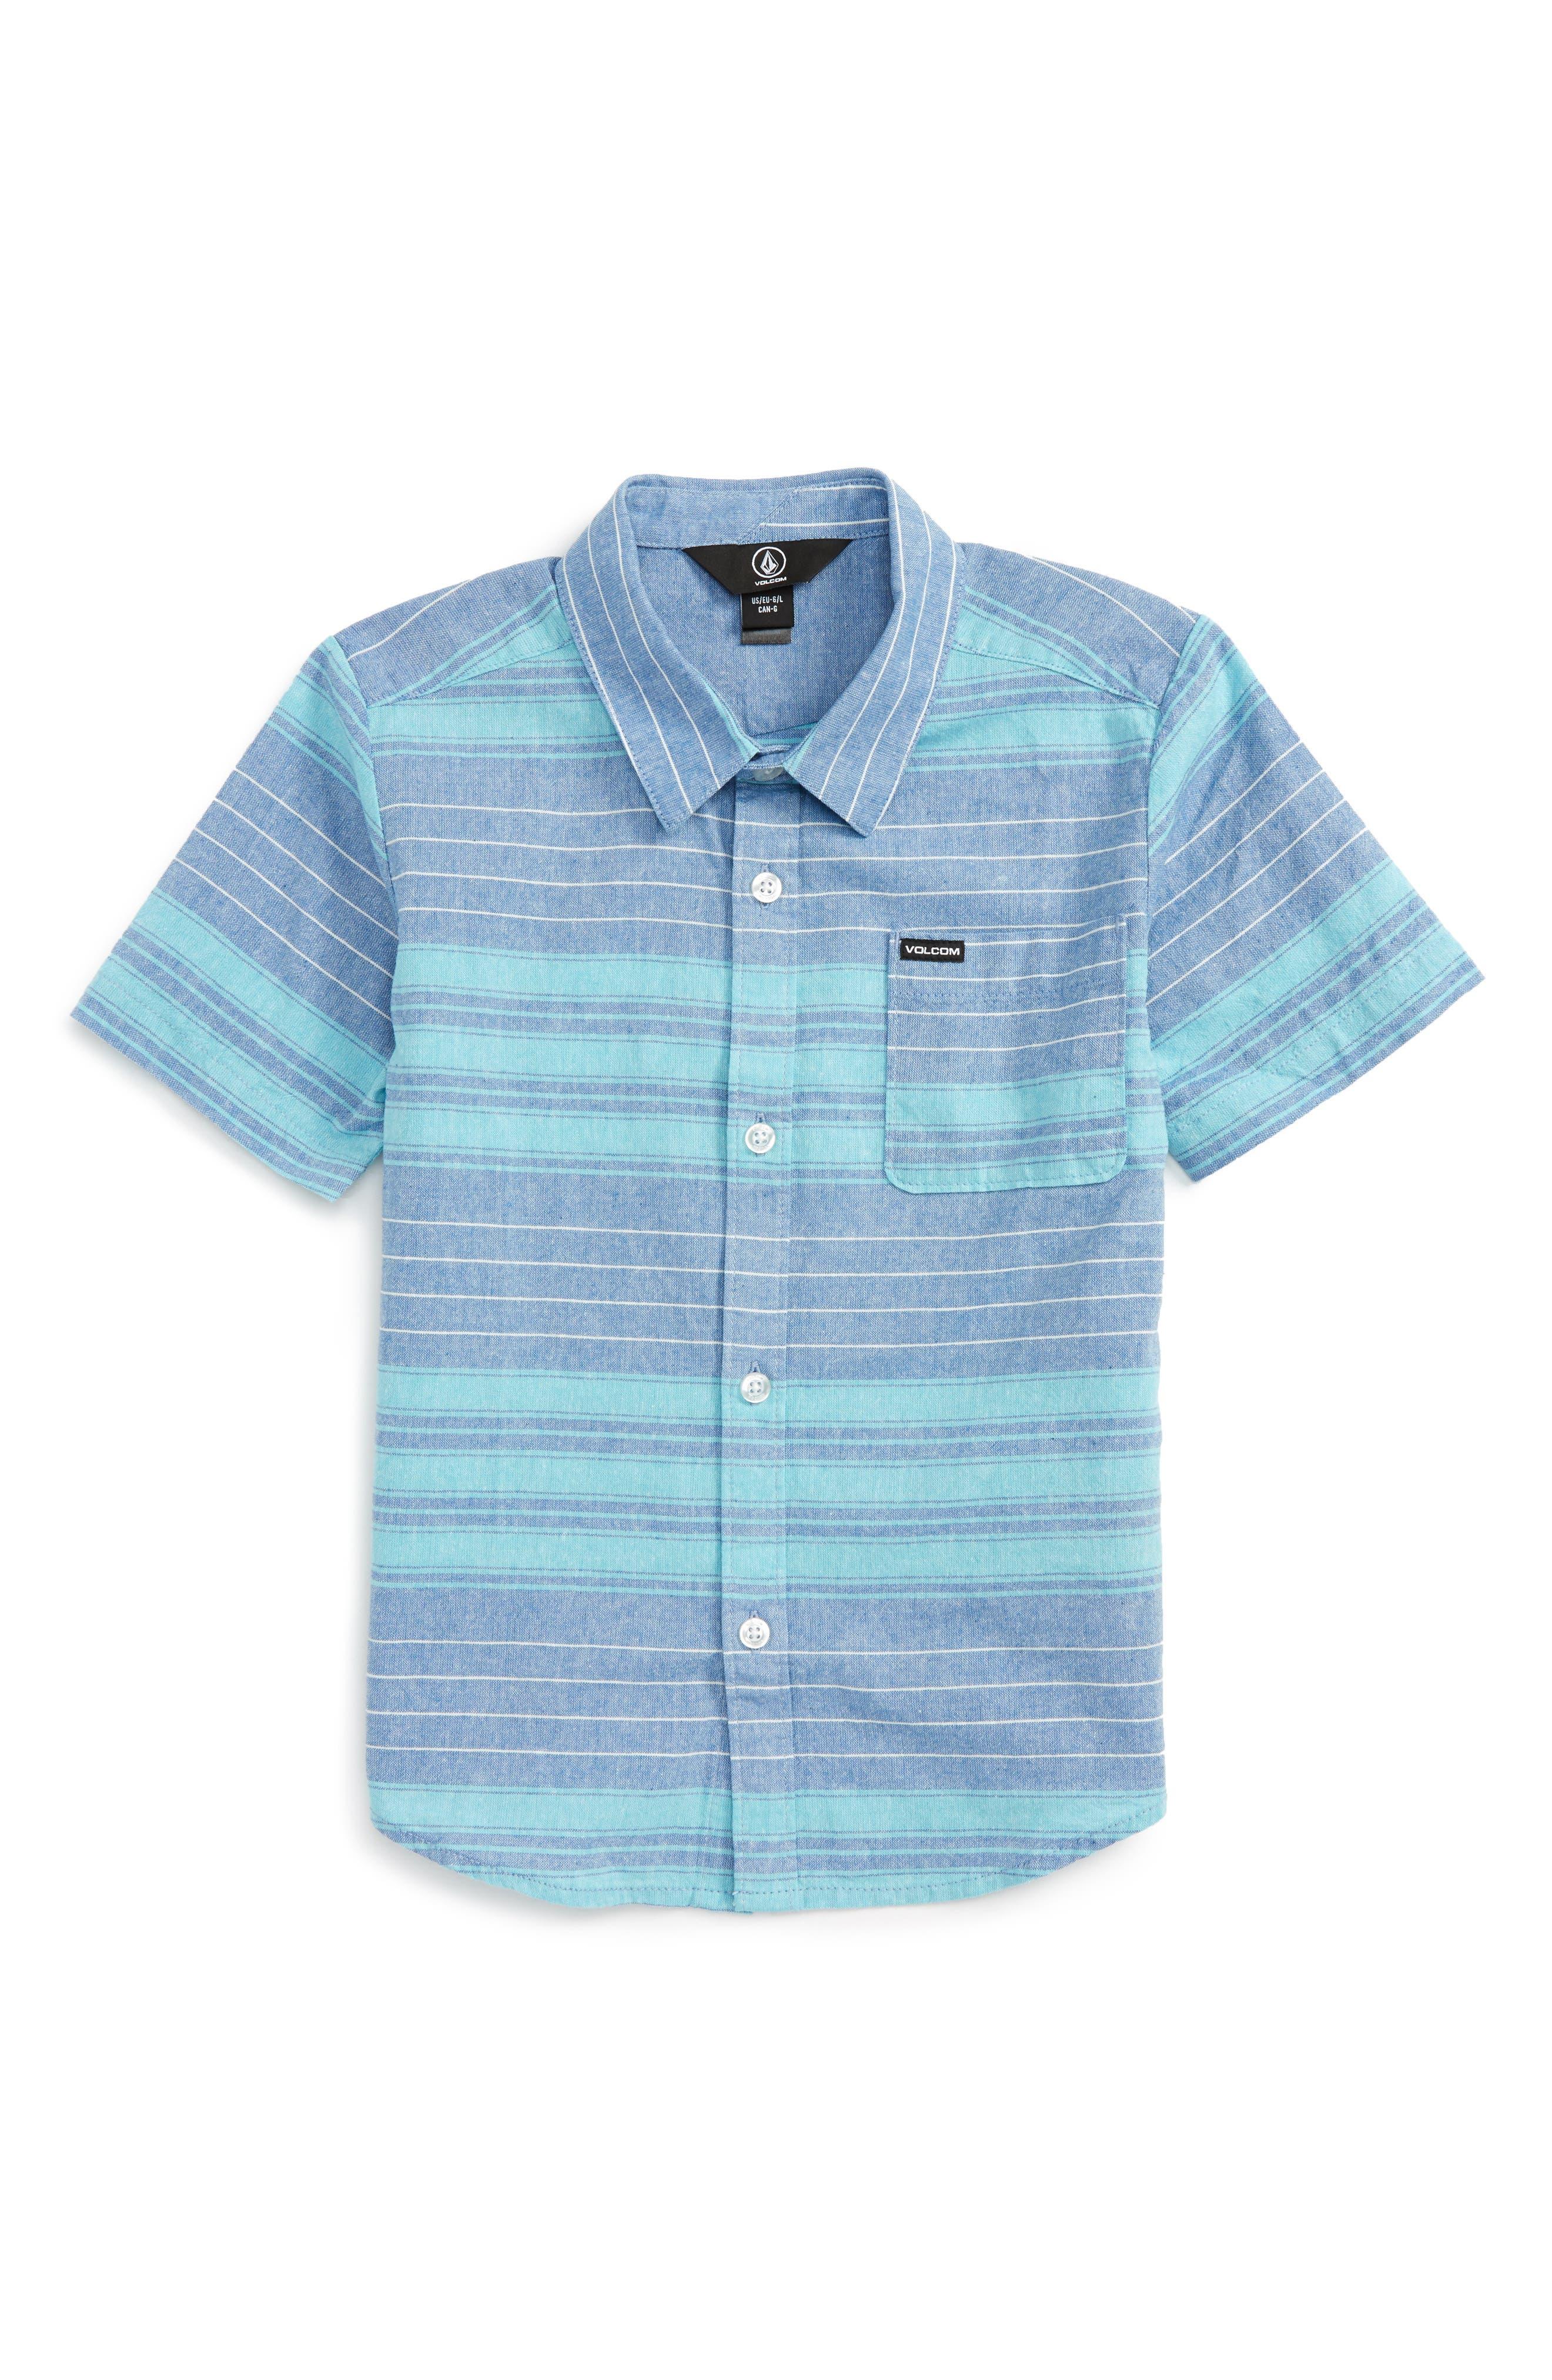 Volcom Meyers Short Sleeve Woven Shirt (Toddler Boys & Little Boys)